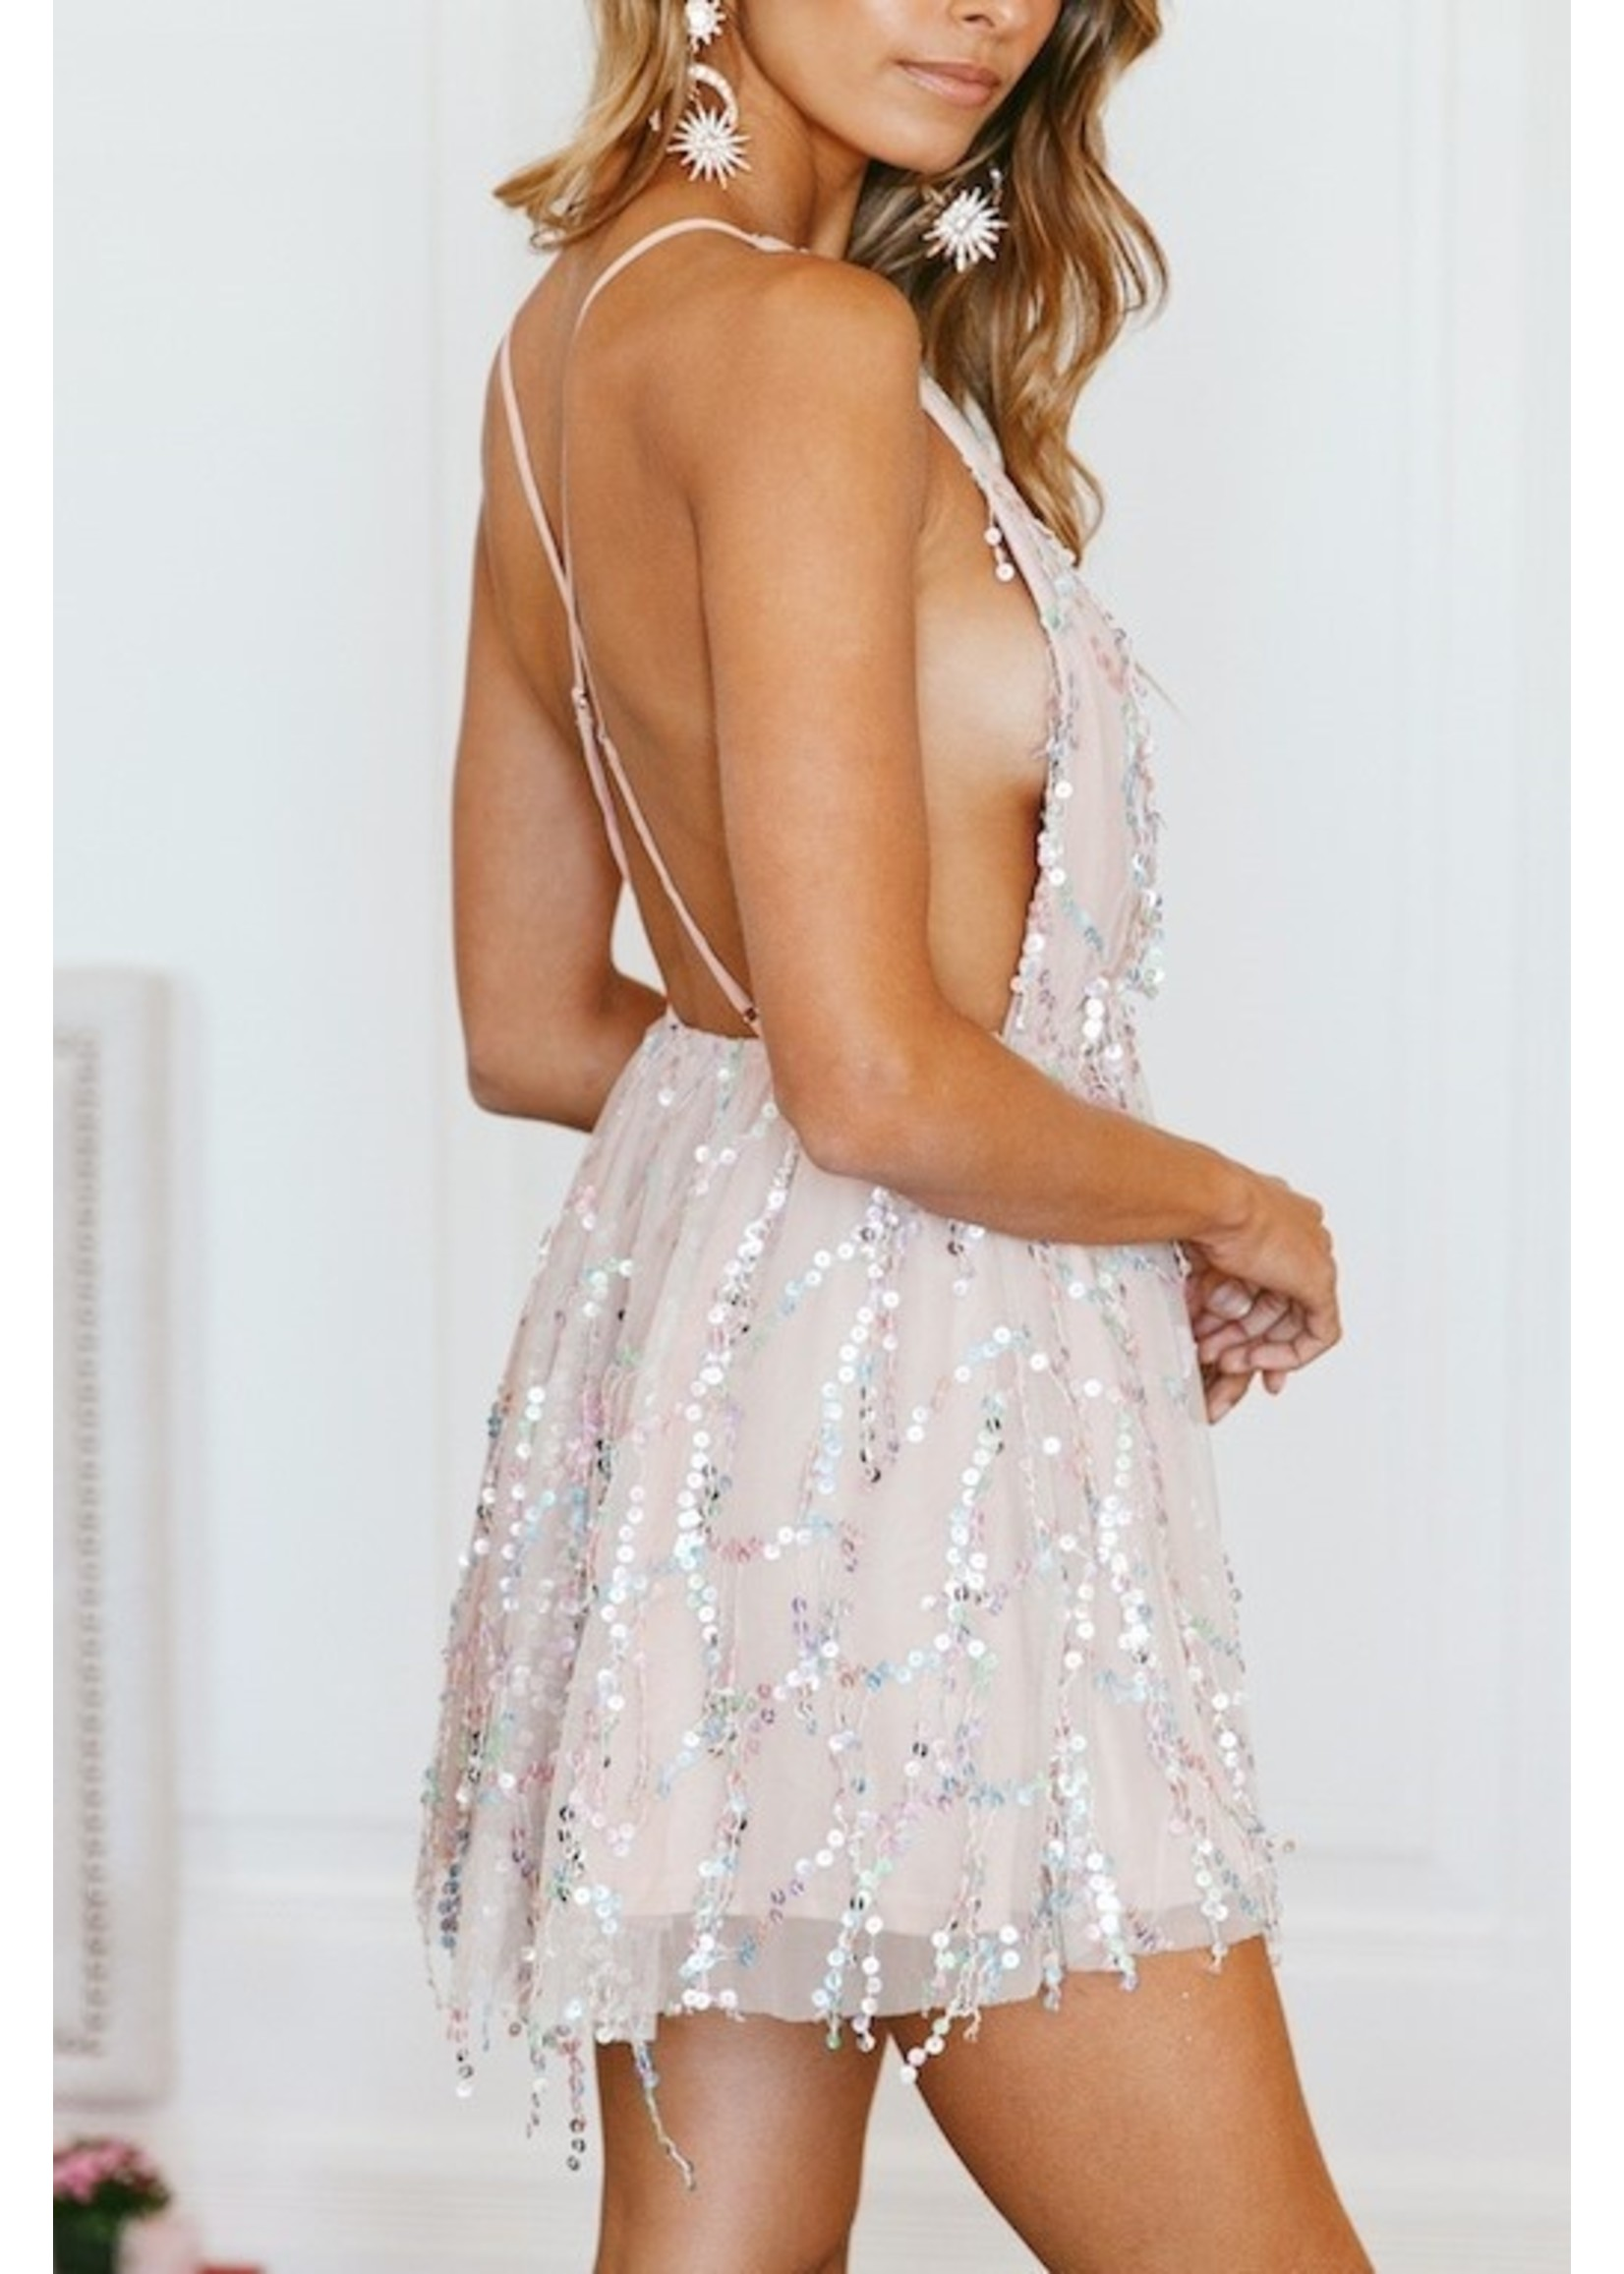 Selfie Leslie Stars & Sparkly Dress Multi